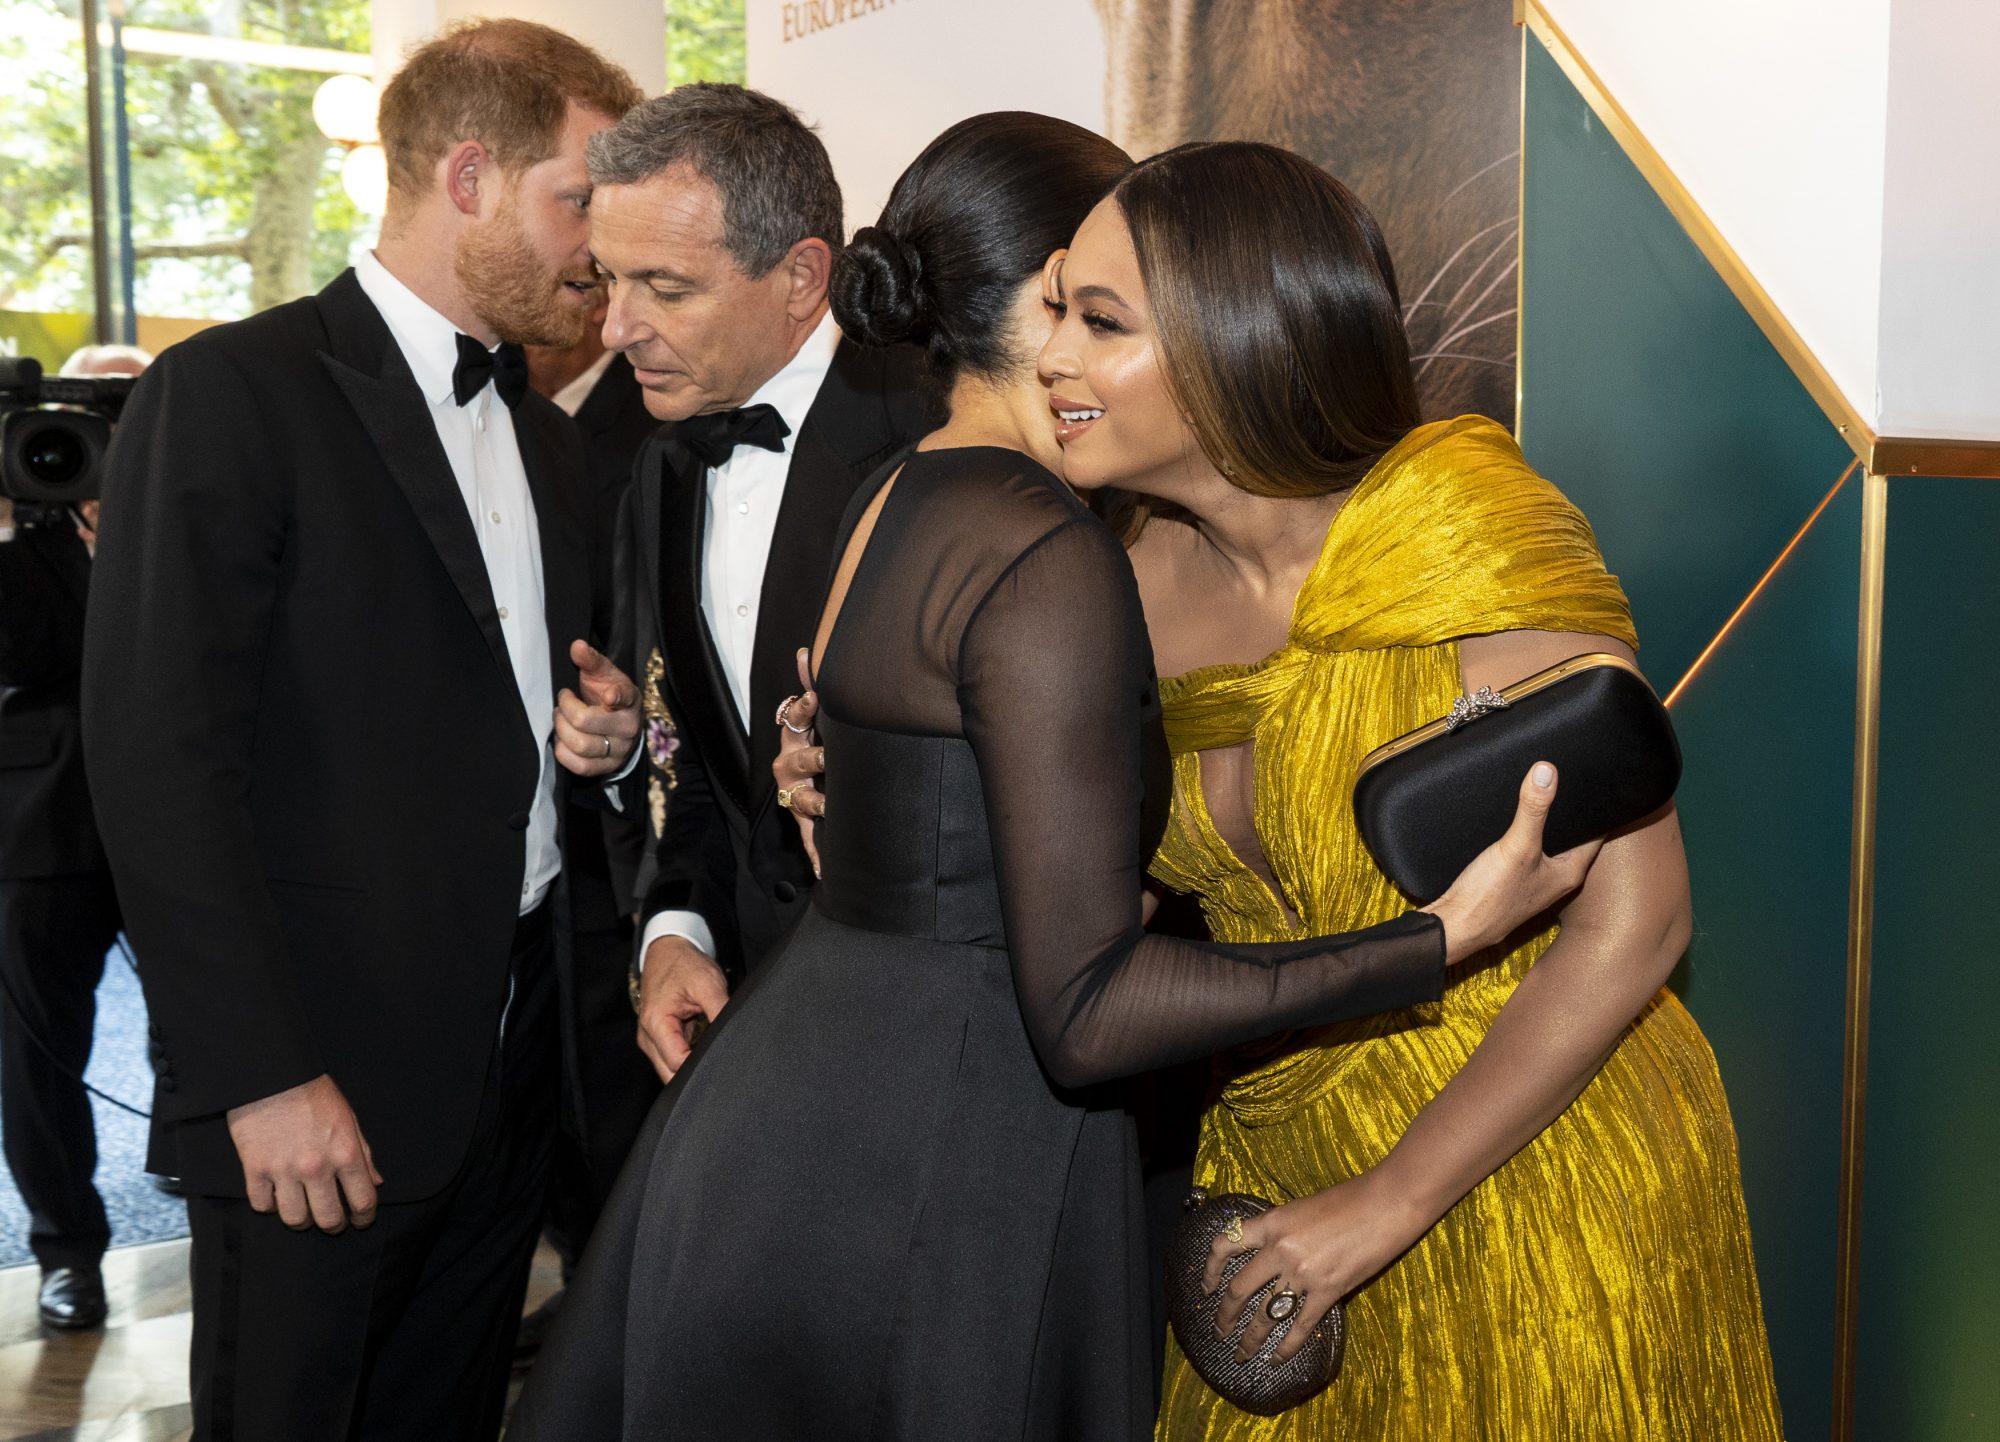 Príncipe Harry, Bob Iger, Meghan Markle, Beyoncé, Jay-Z